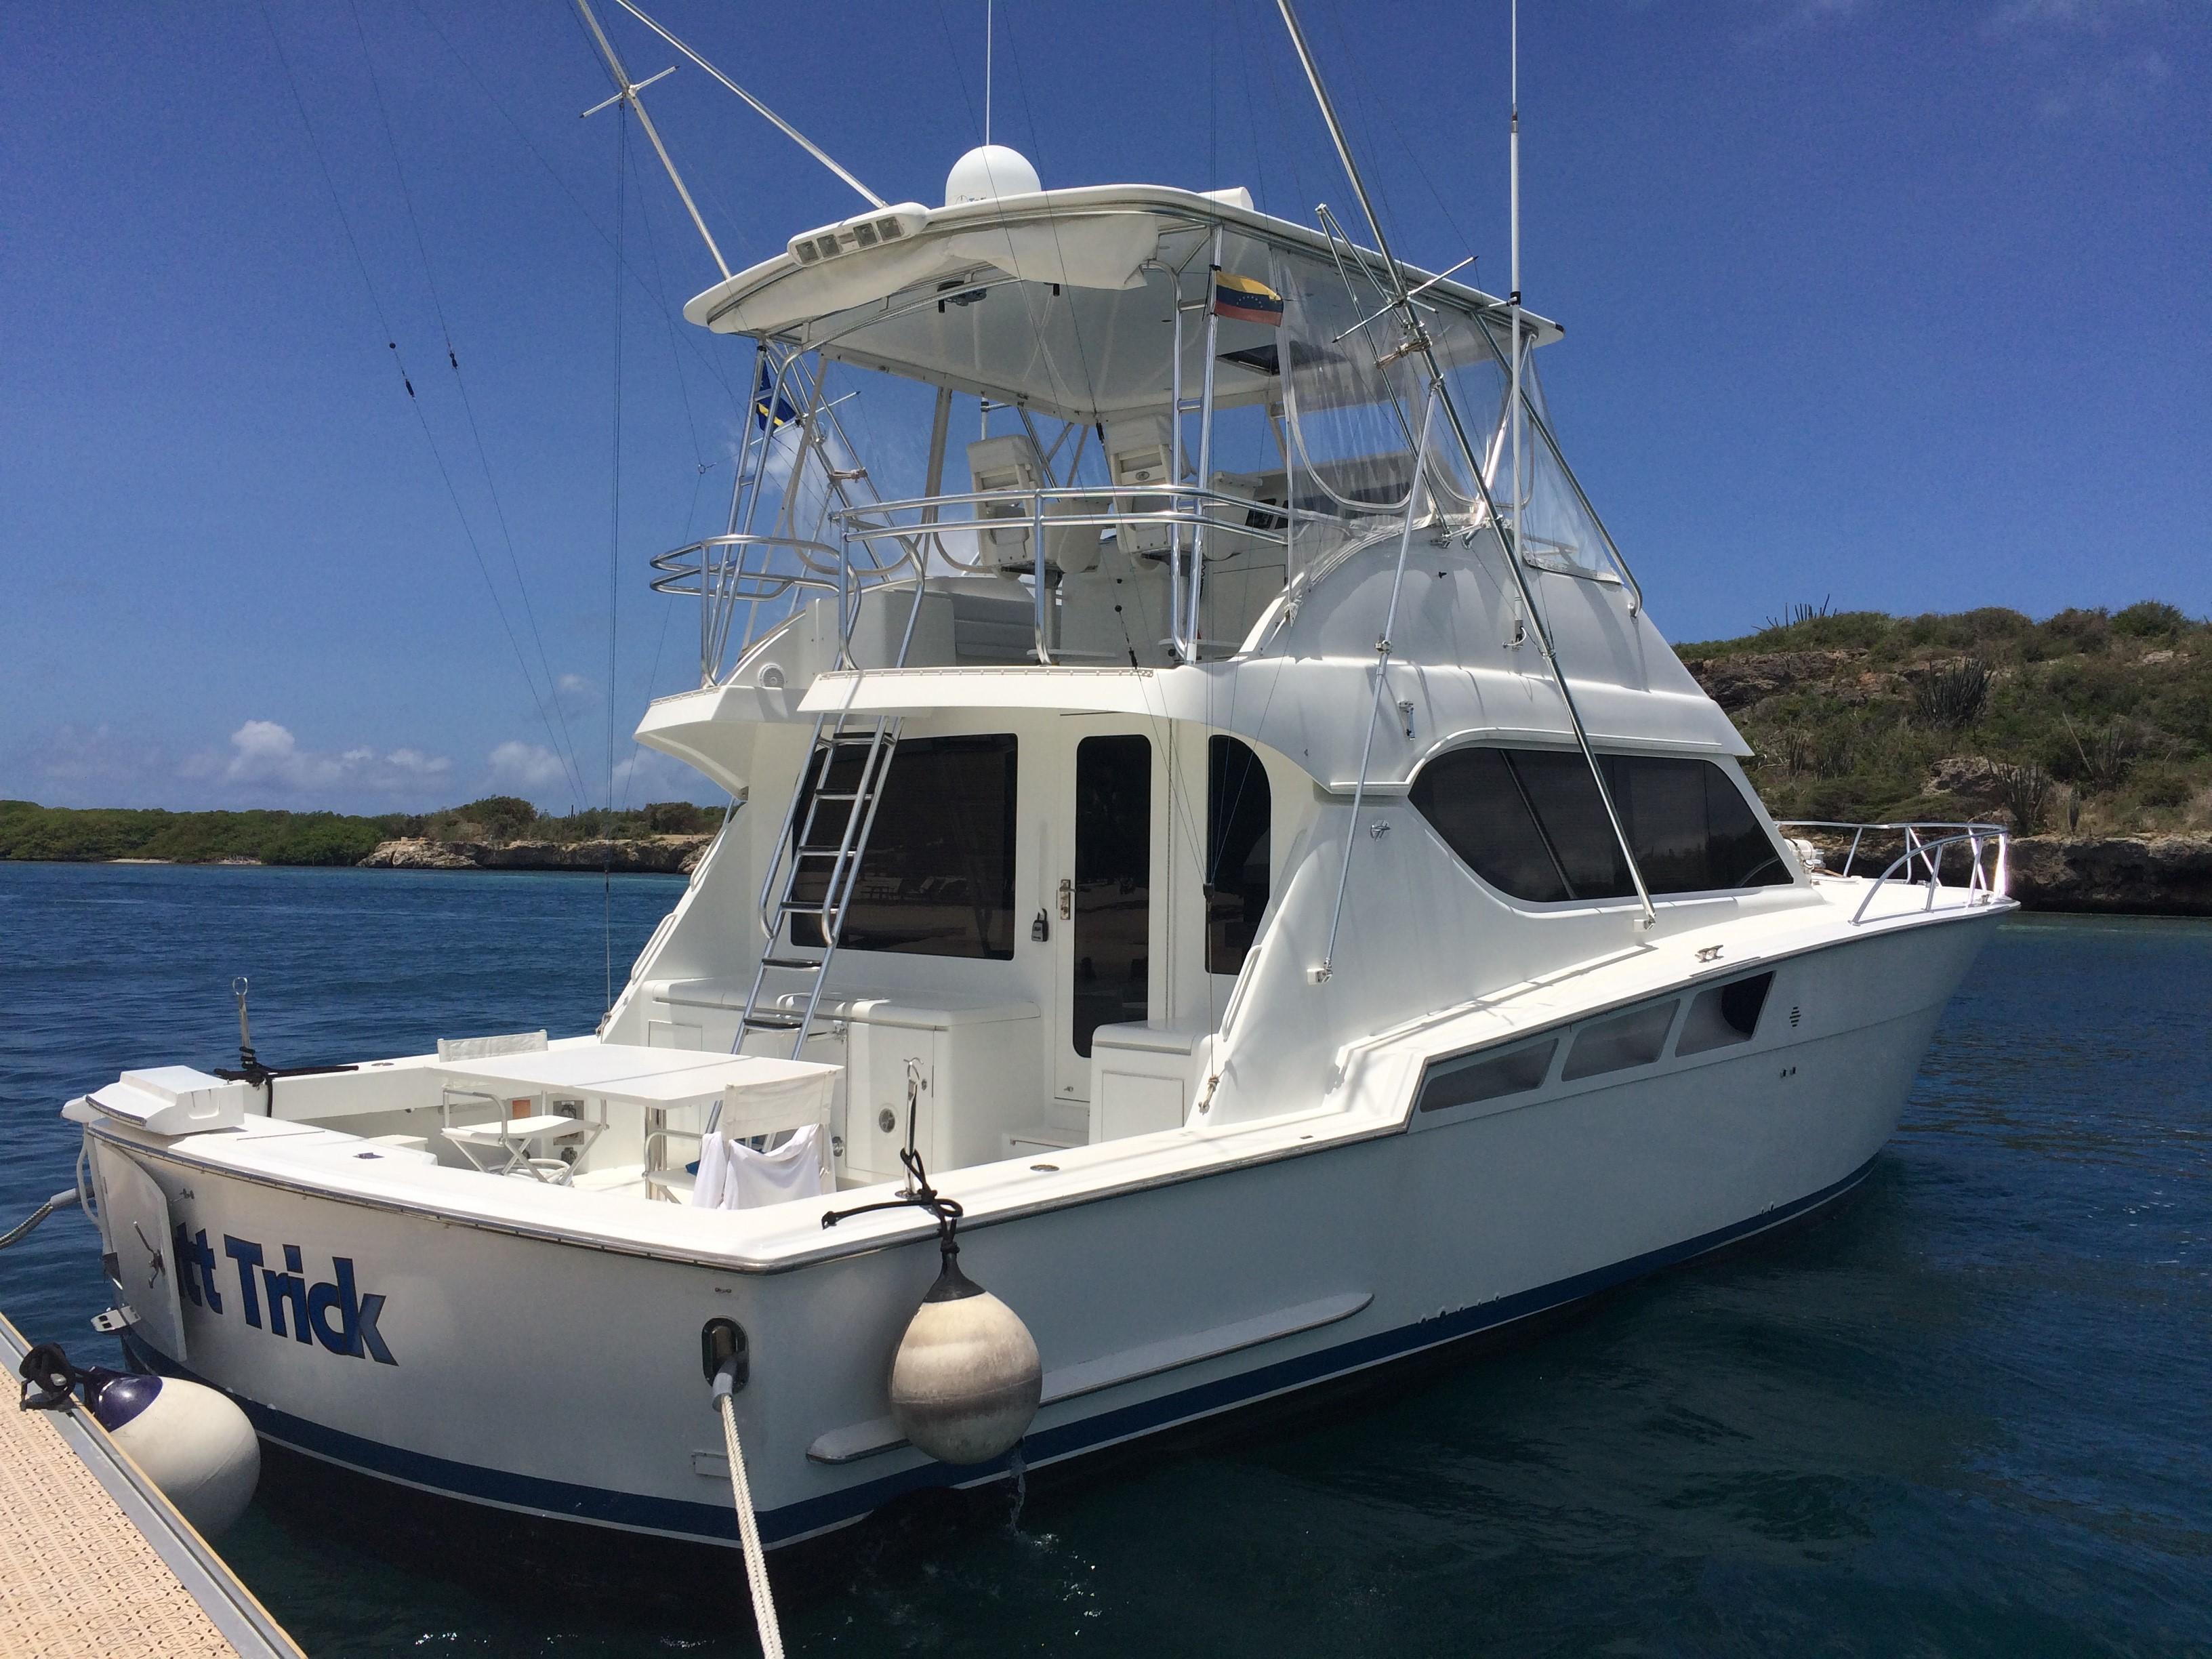 55' Hatteras Sportfish Convertible HATT TRICK